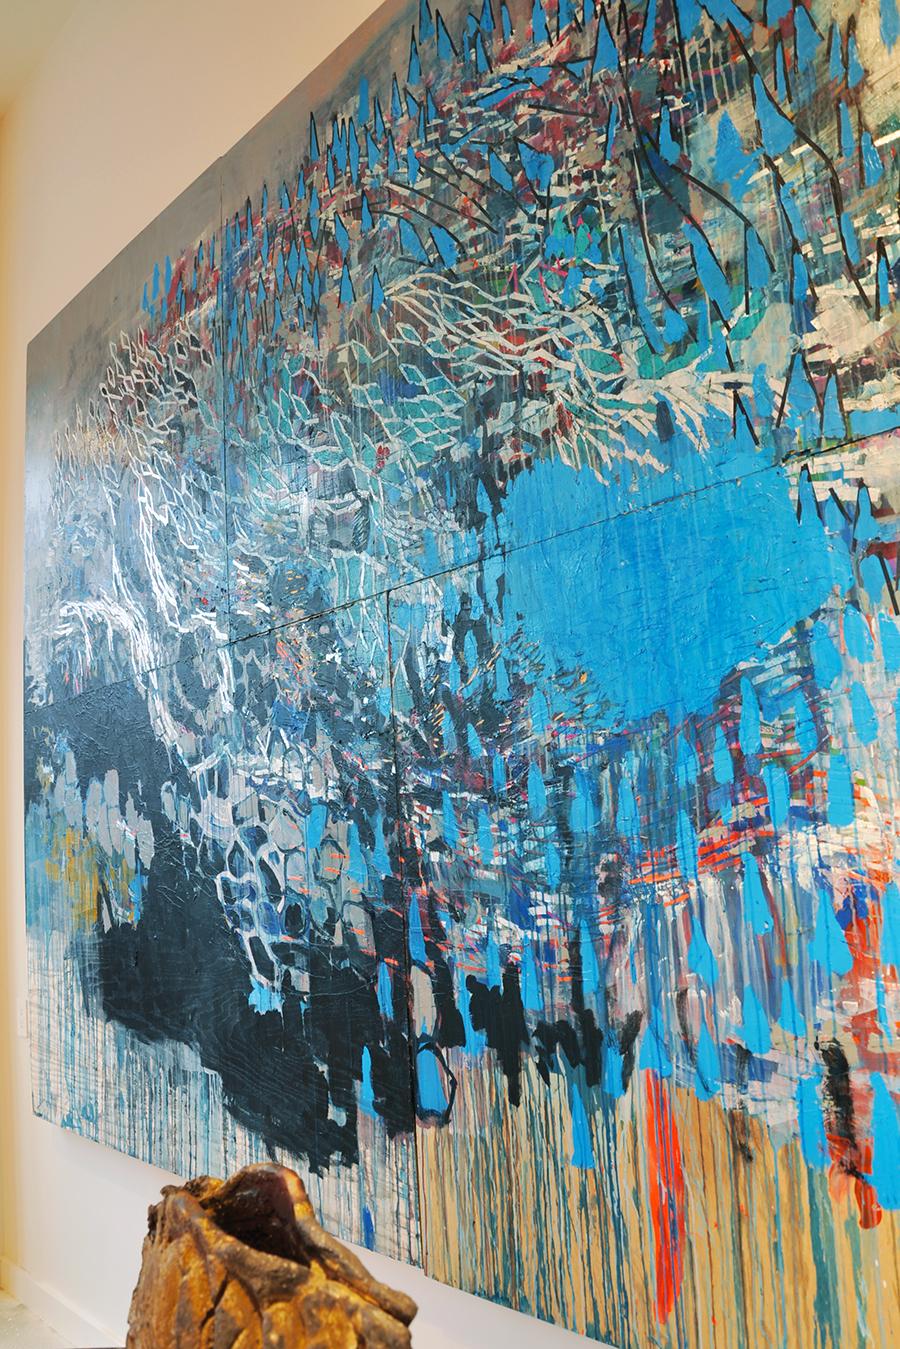 Guillaume Paturel detail featured at Atelier Mira in Williamsburg